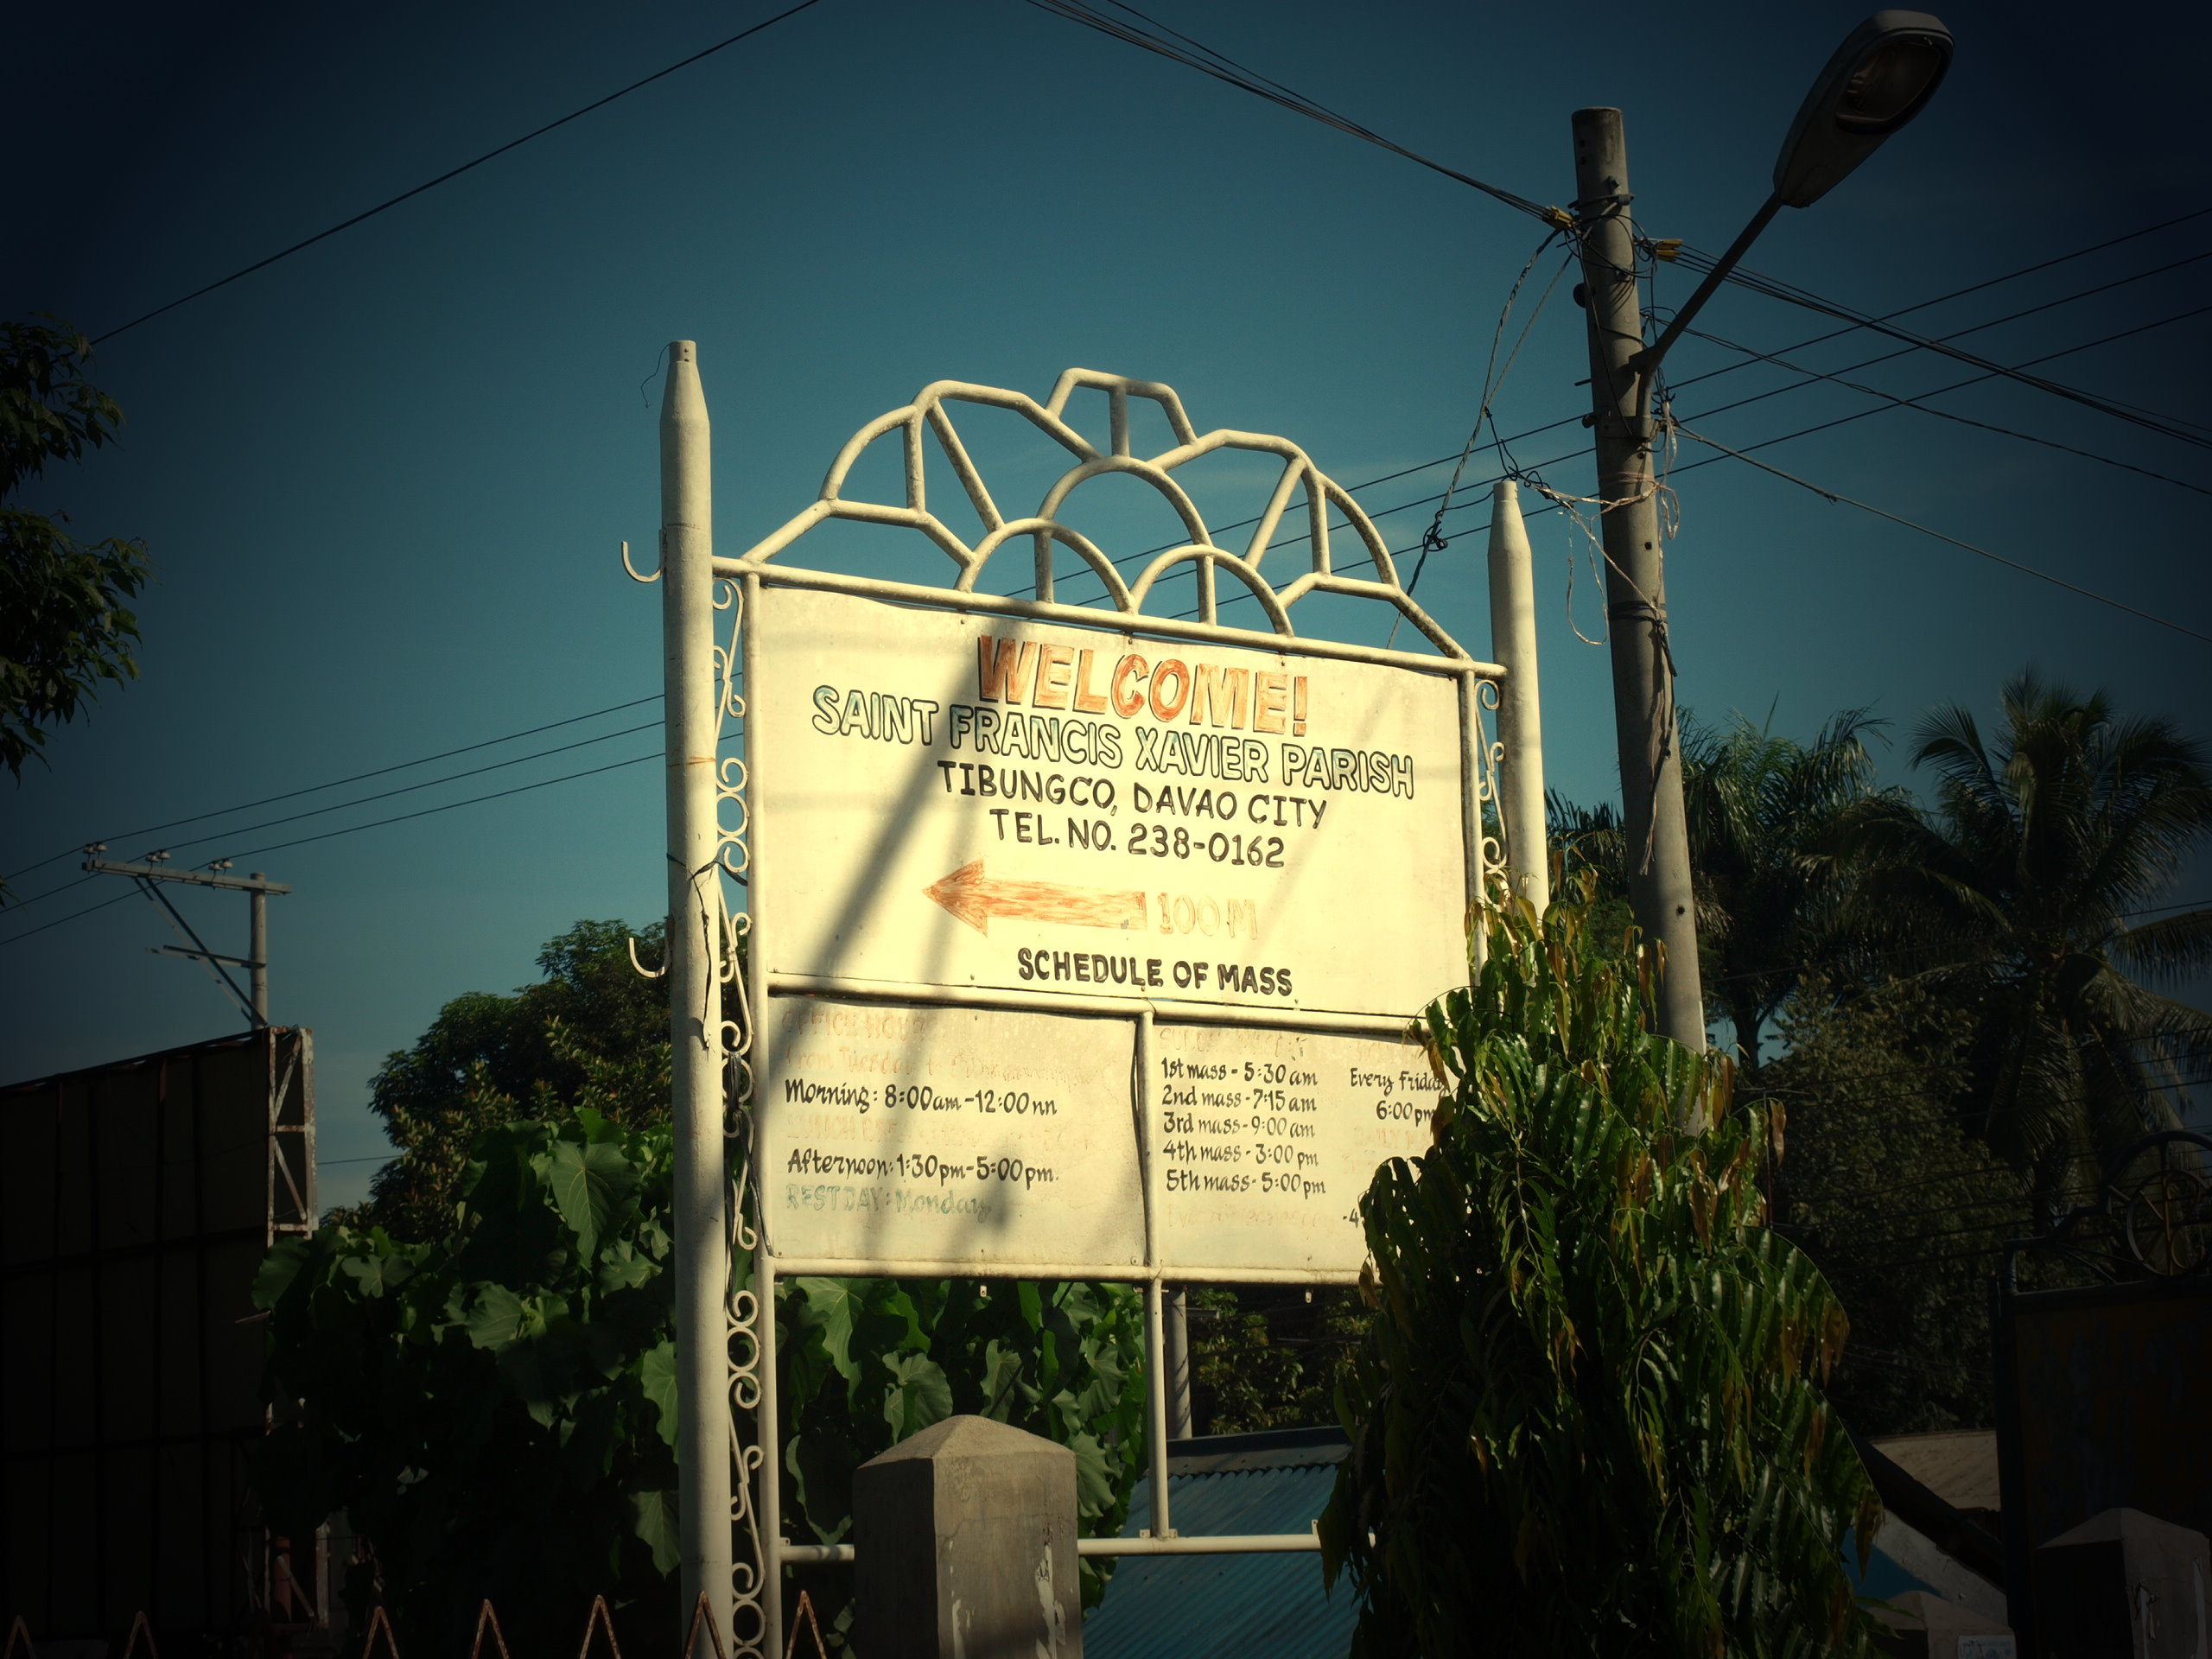 Tibungco davao city